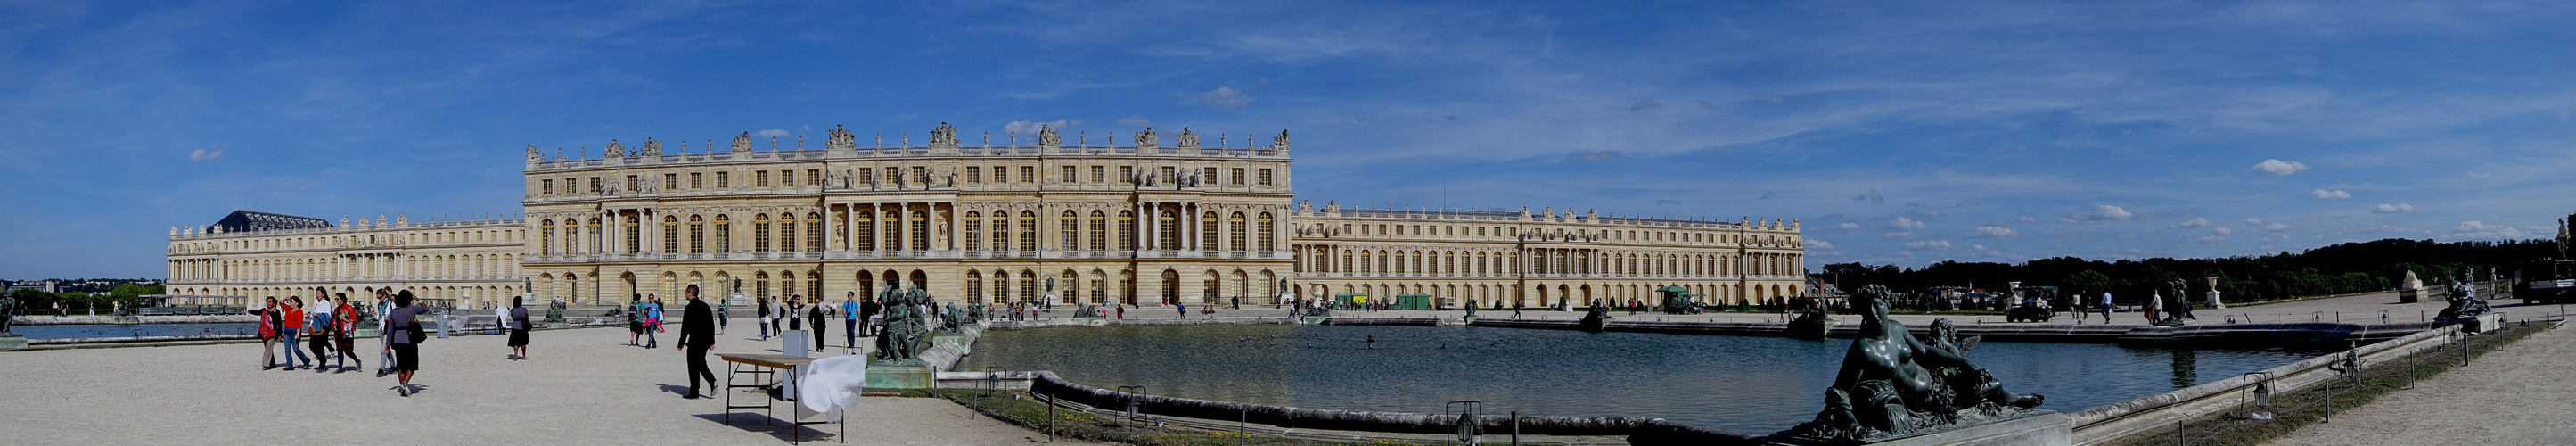 Schloß Versailles - Paris